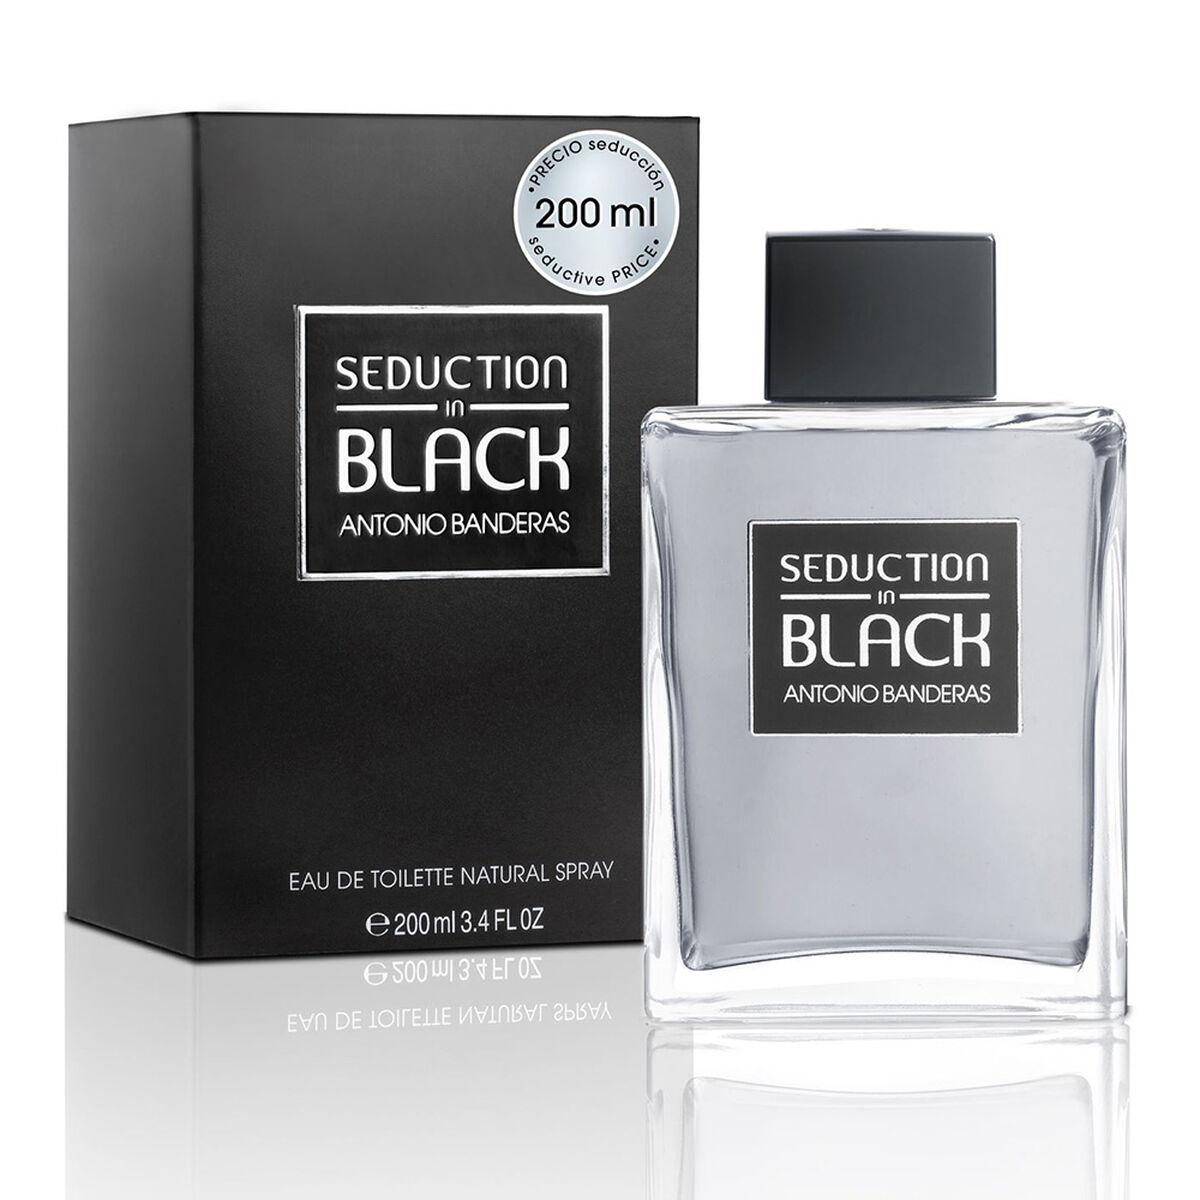 Perfume Antonio Banderas Black 200 ml